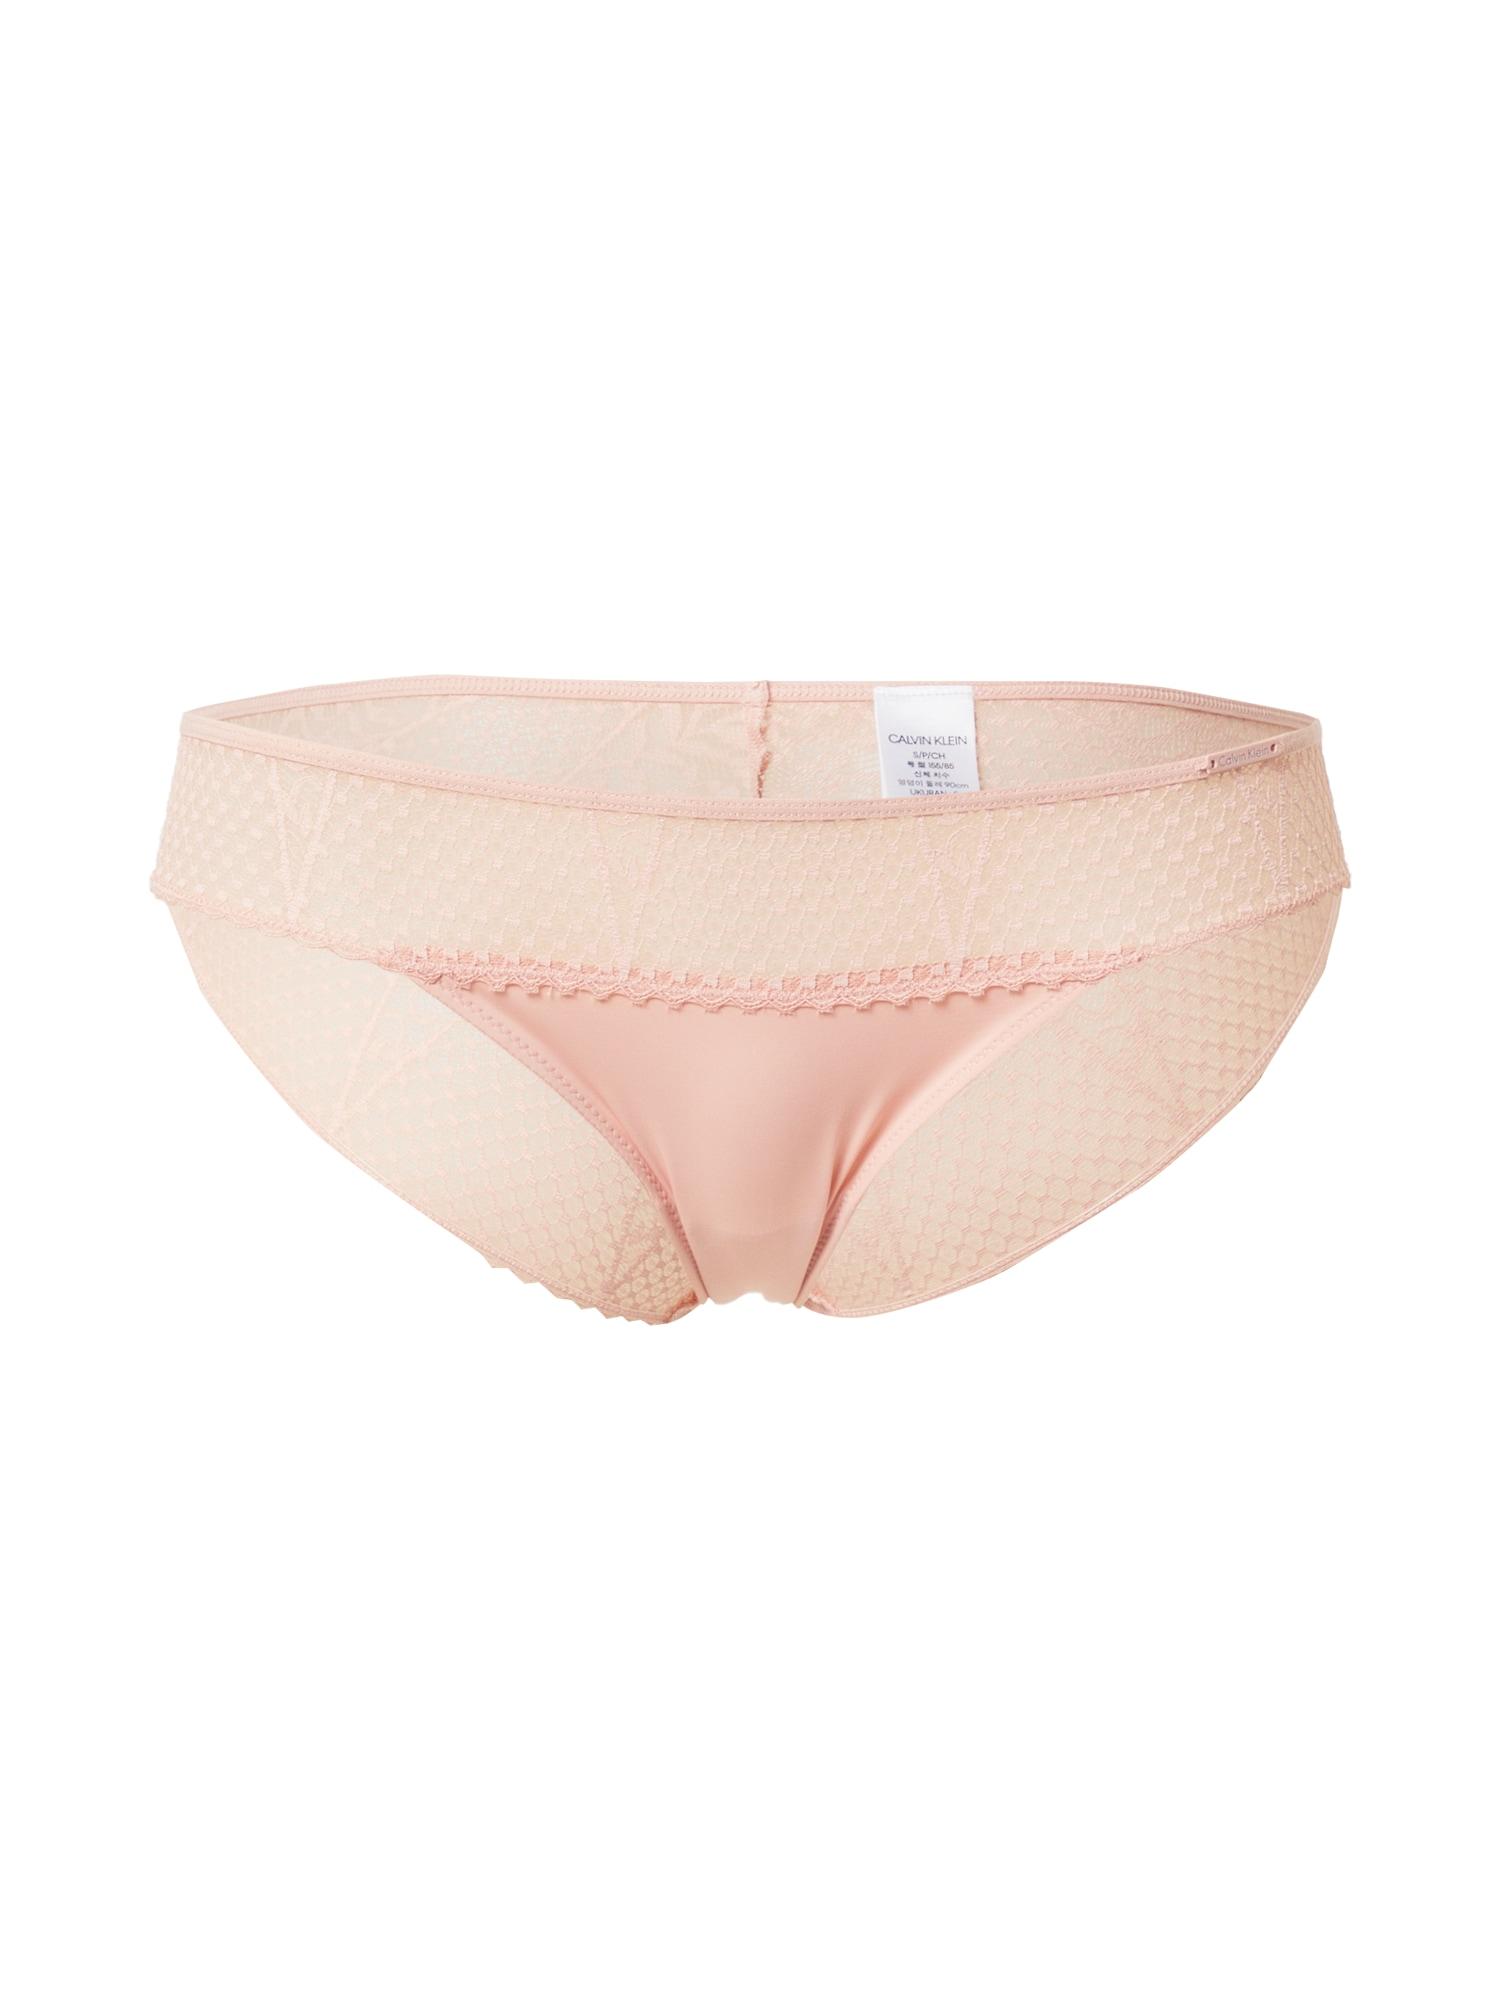 Calvin Klein Underwear Moteriškos kelnaitės rožių spalva